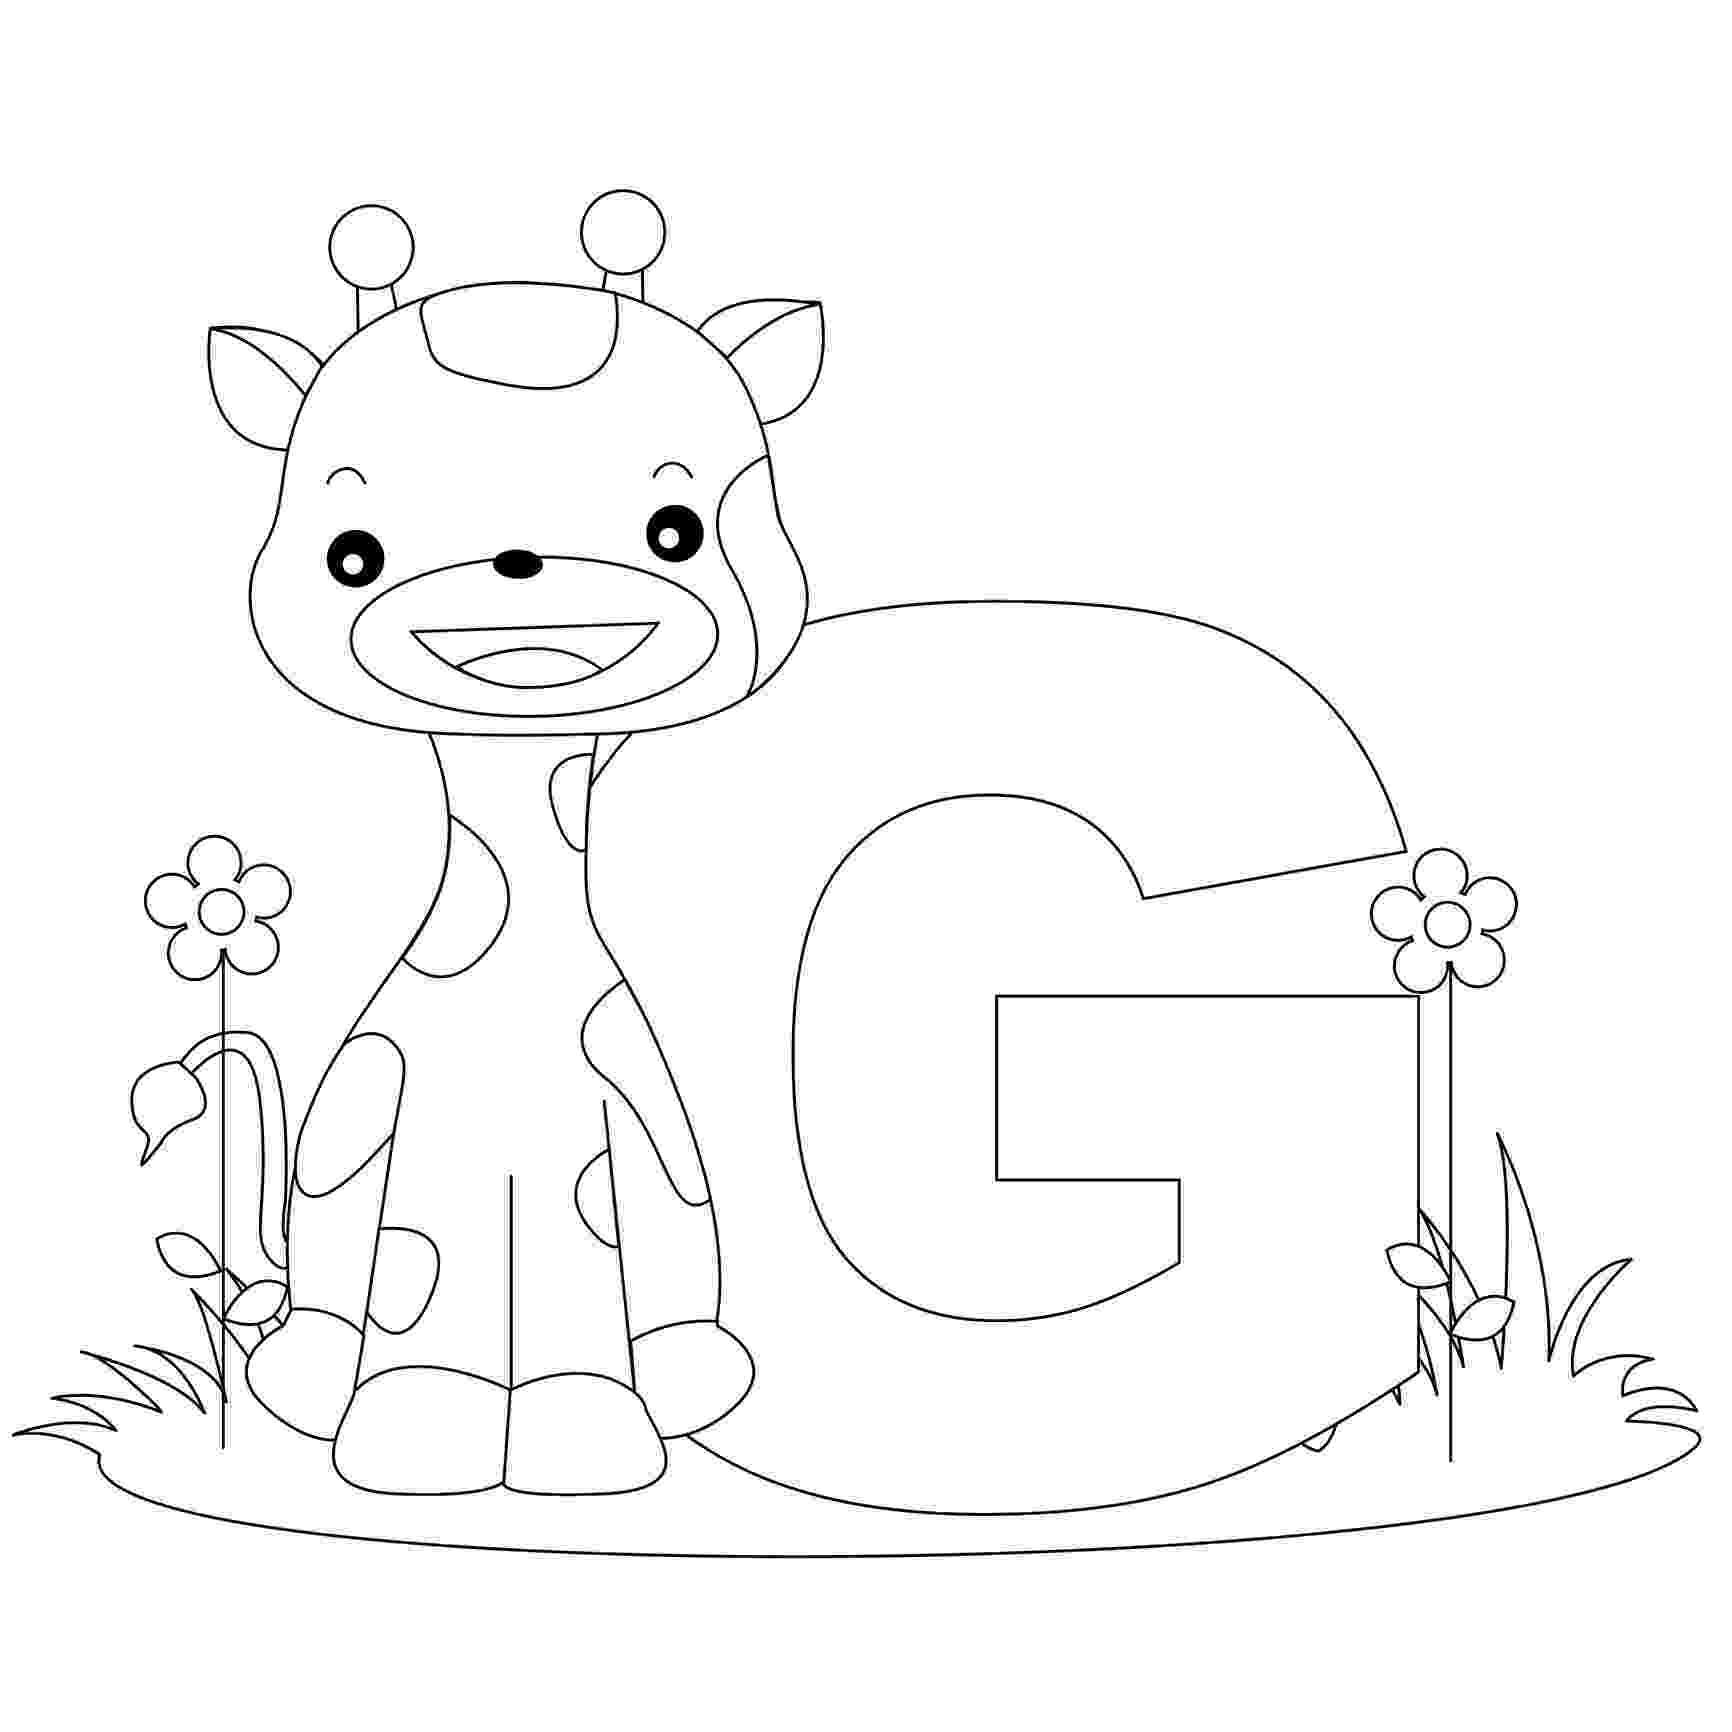 coloring animal alphabet free printable alphabet coloring pages for kids best coloring alphabet animal 1 4